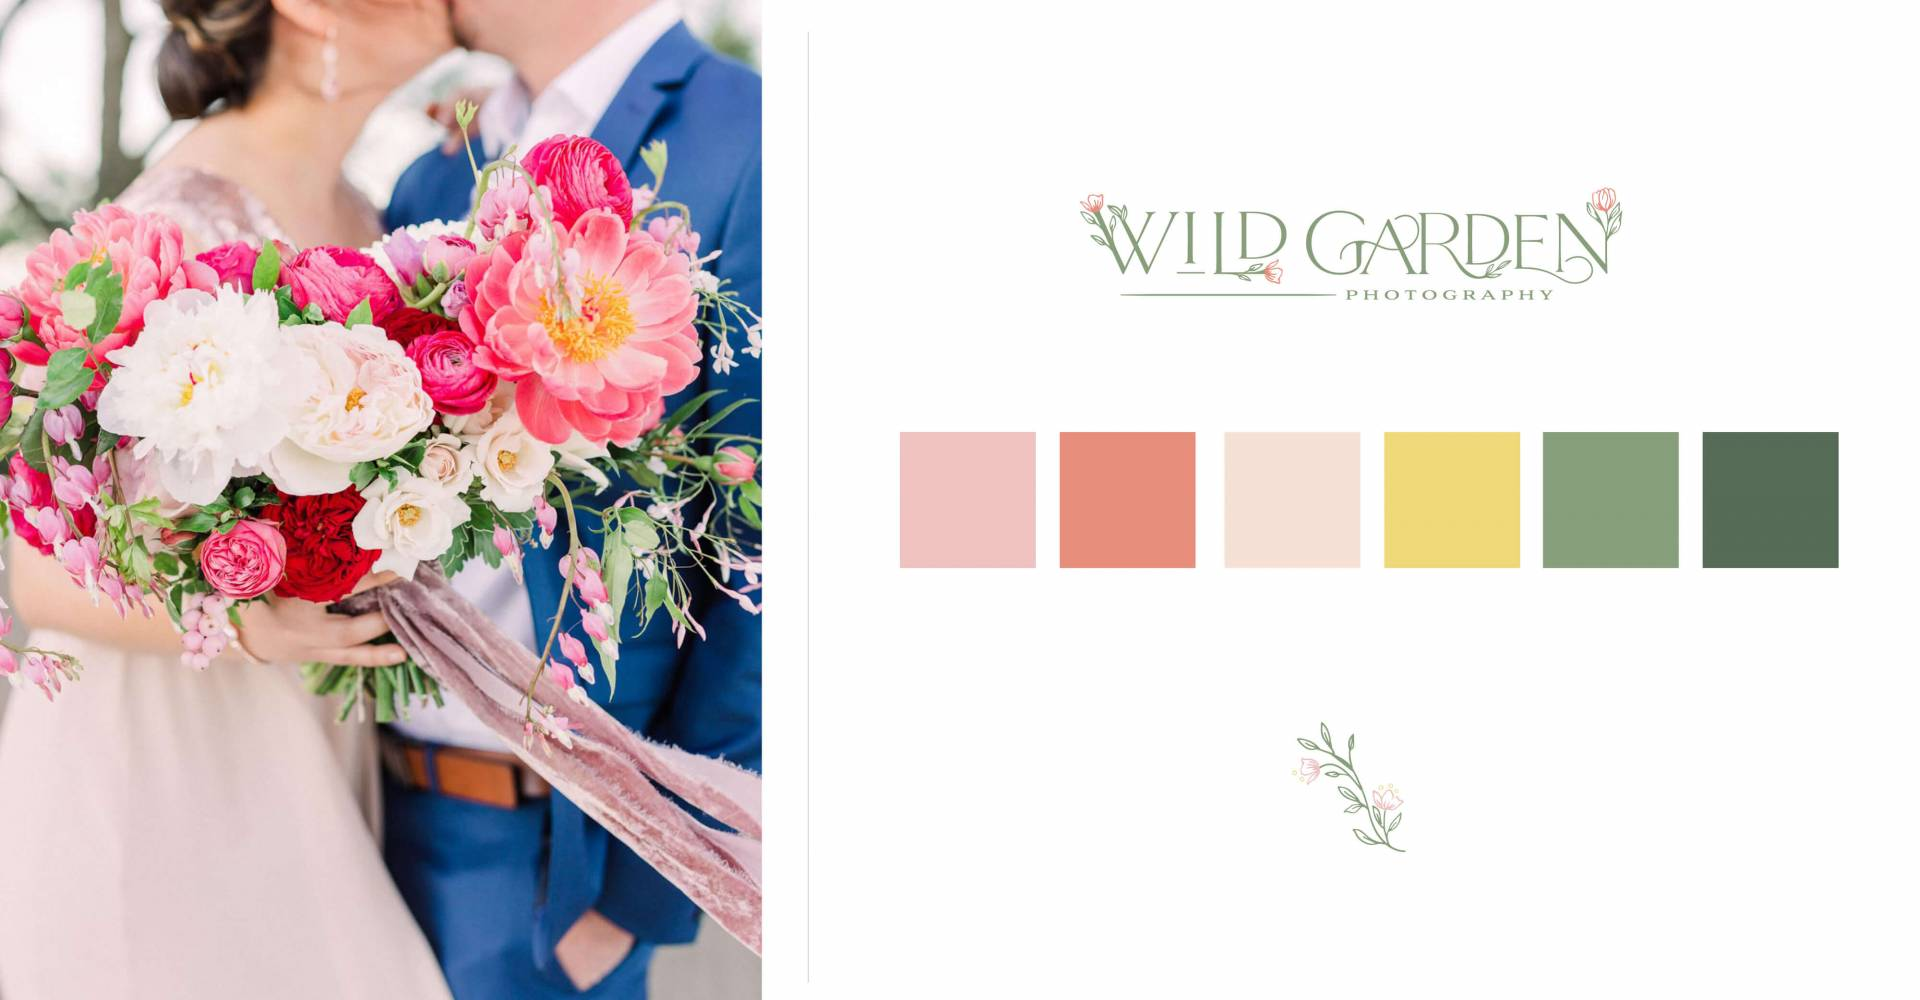 Wild Garden Photography houston wedding photographer branding